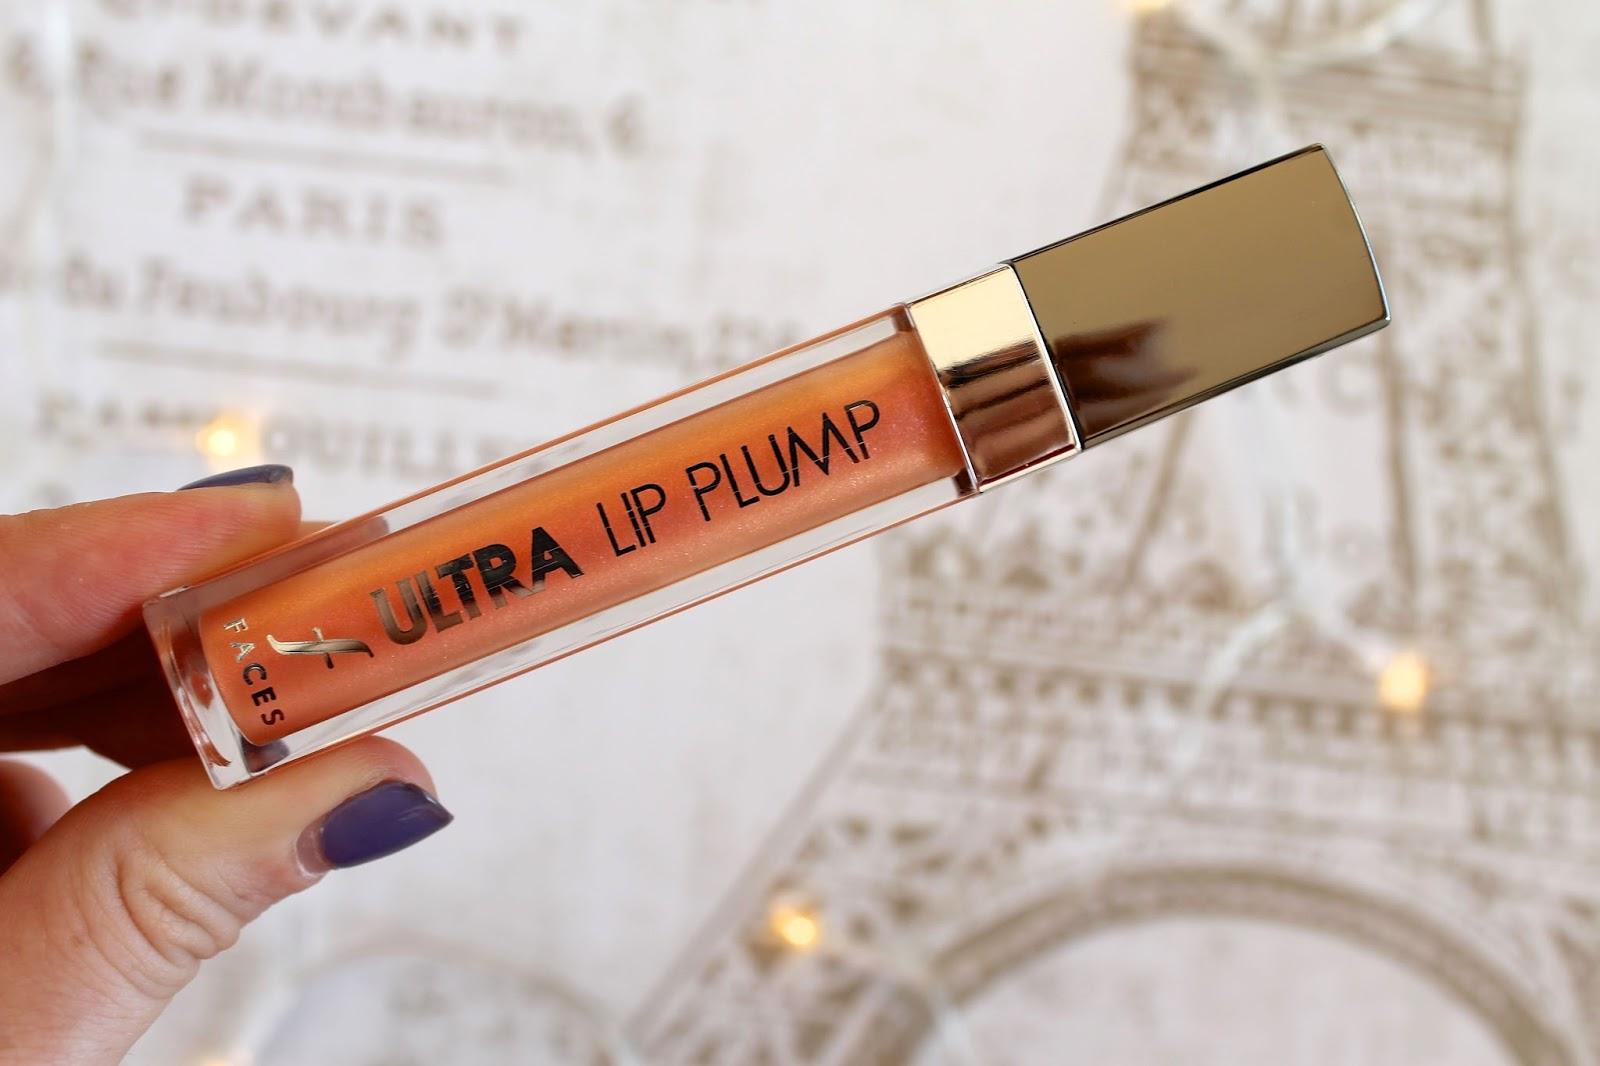 Faces Ultra Lip Plump review